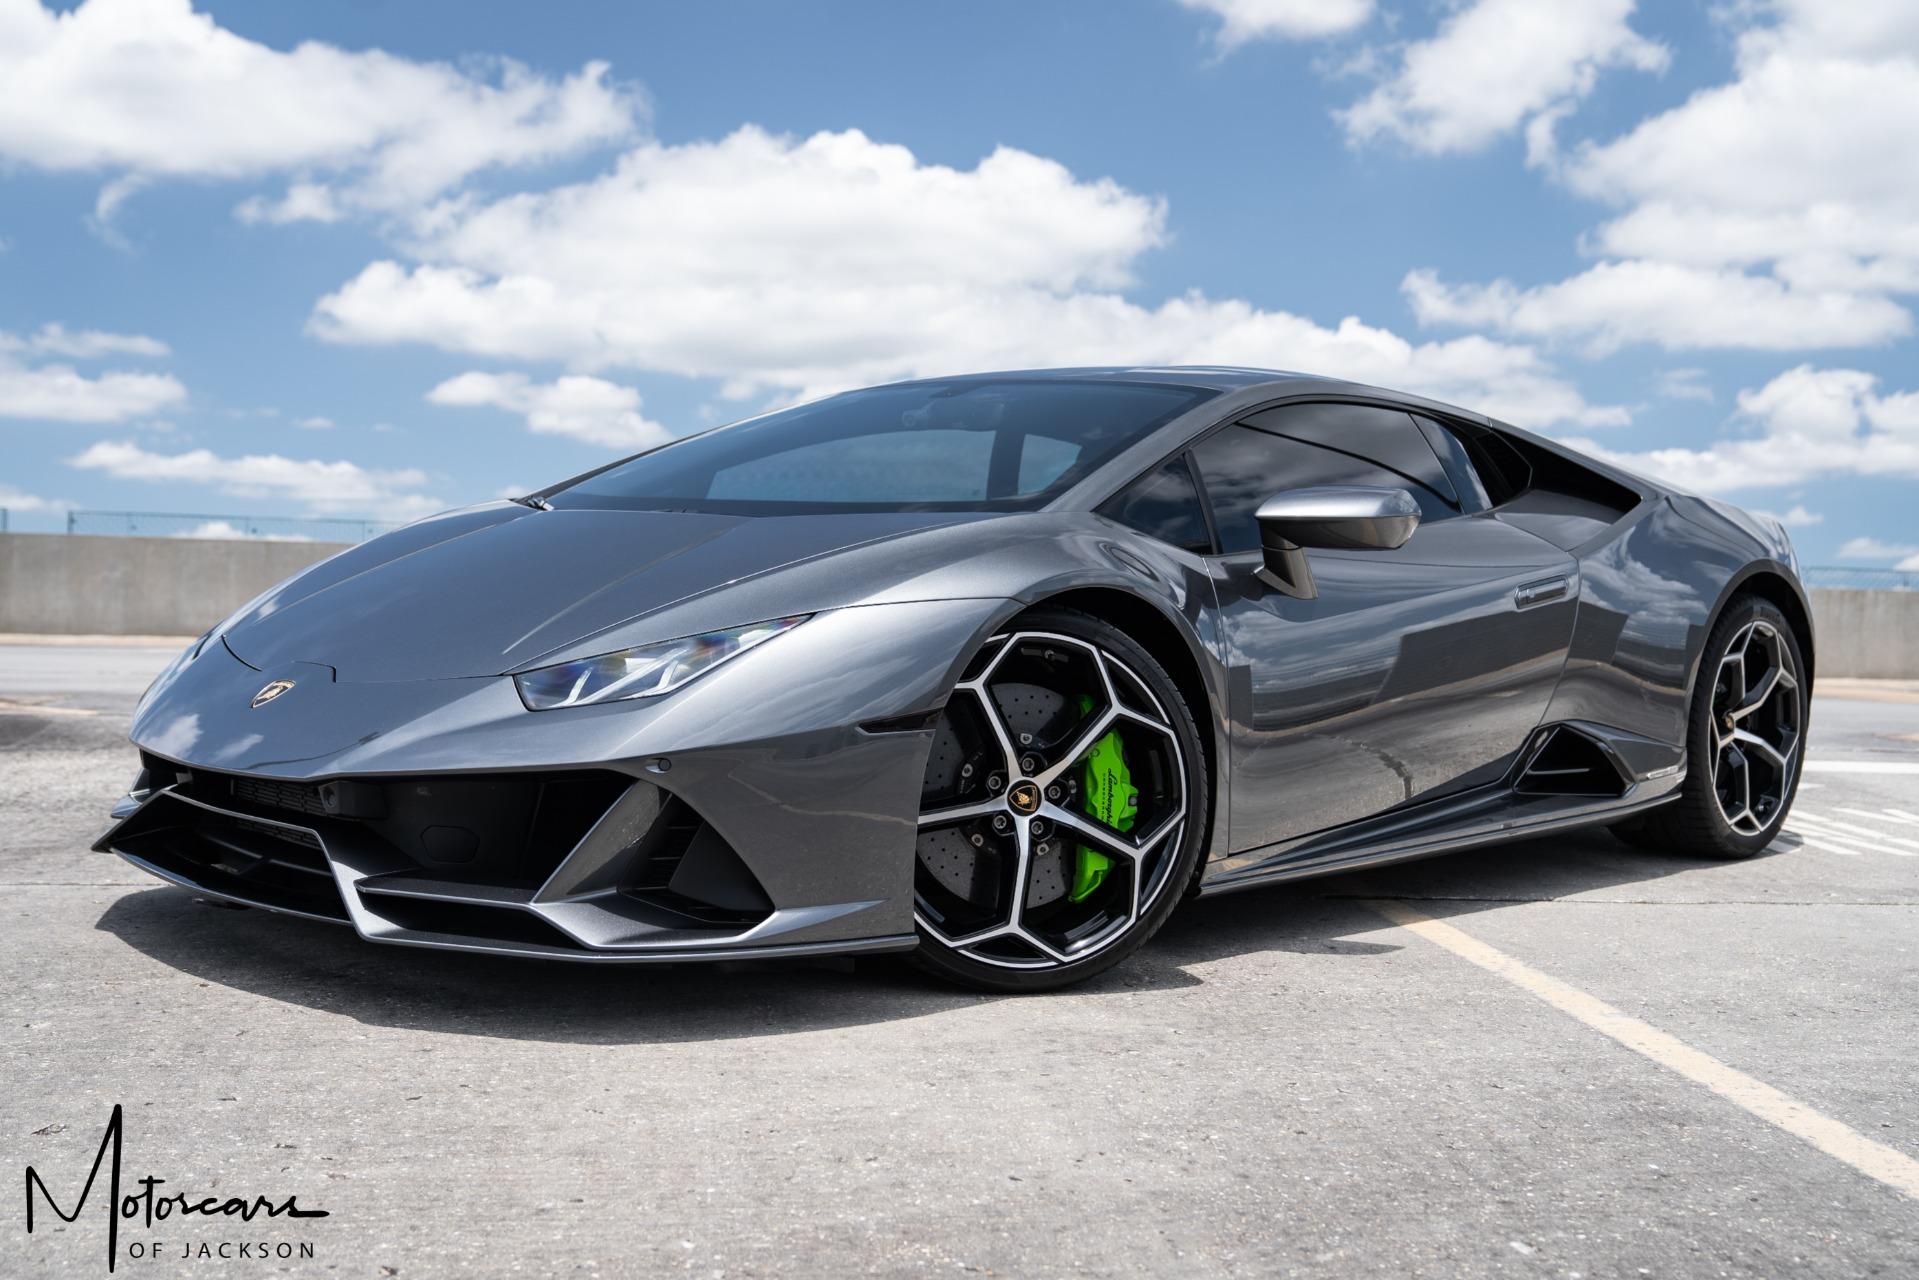 Used-2020-Lamborghini-Huracan-EVO-Jackson-MS